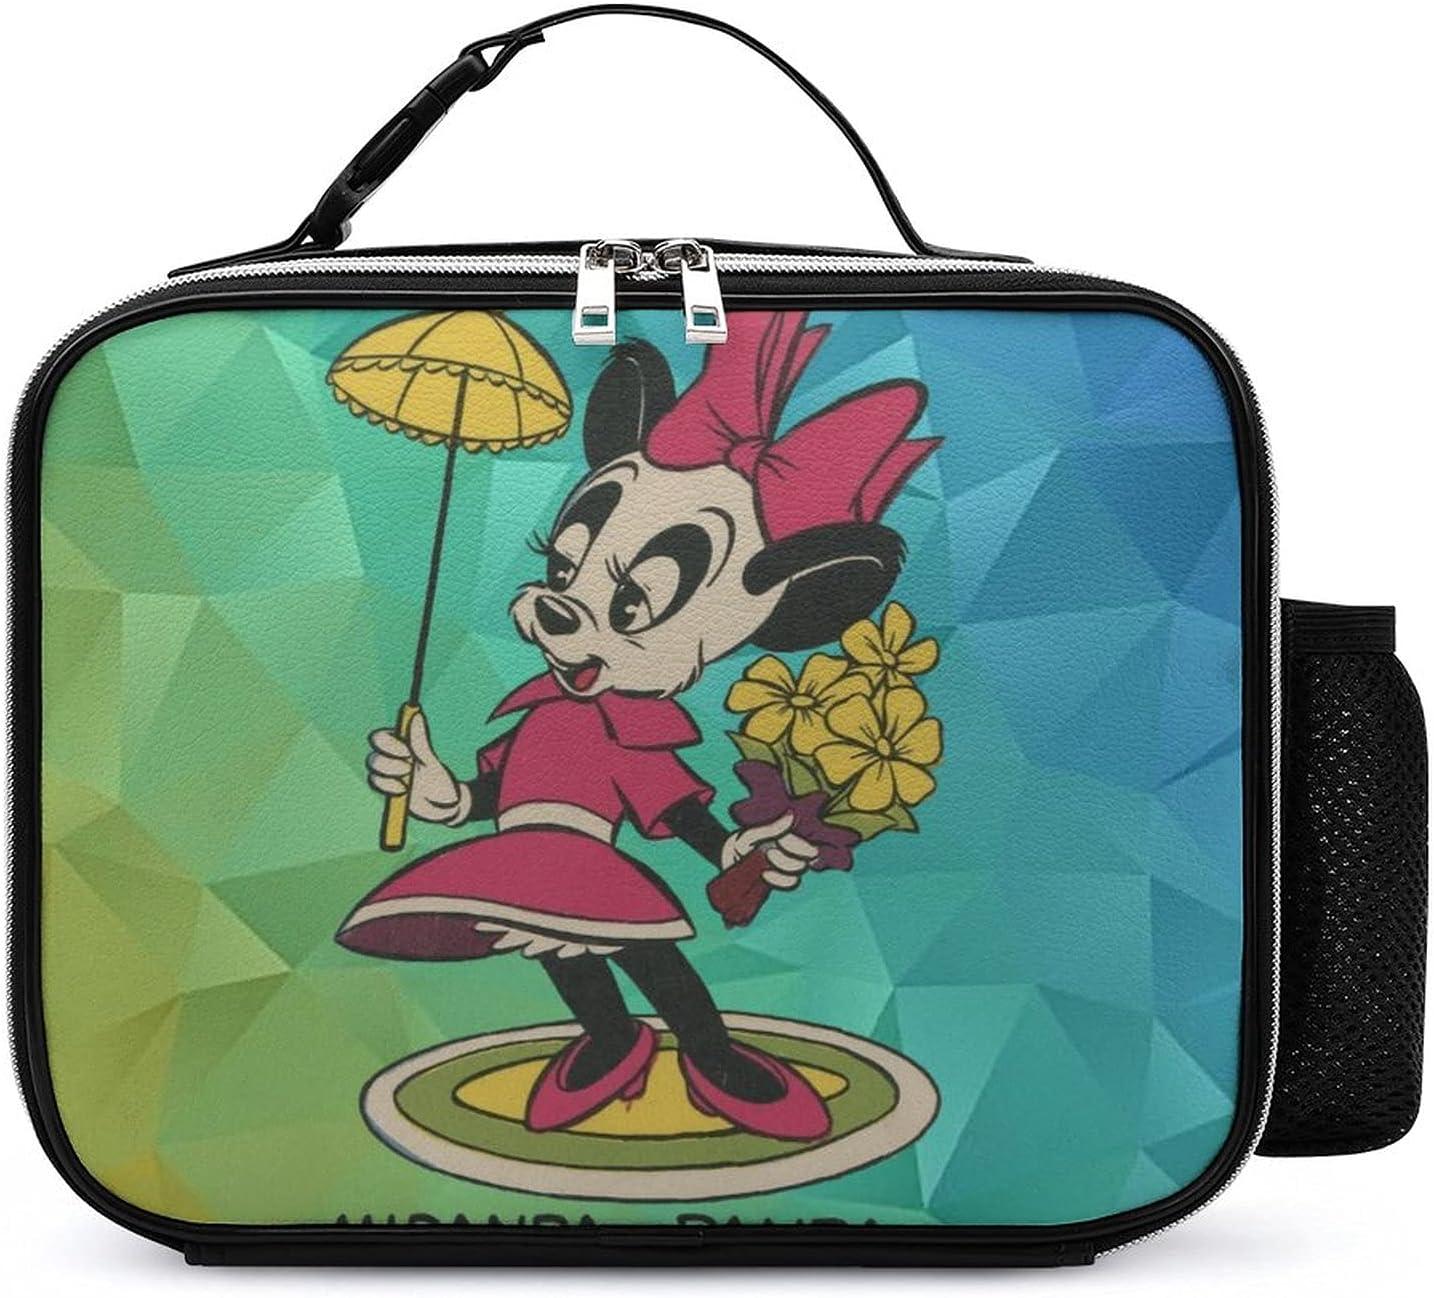 Panda an-dy Anime Merch San Antonio Free shipping Mall PU Lunch Leather Box Bag Portable